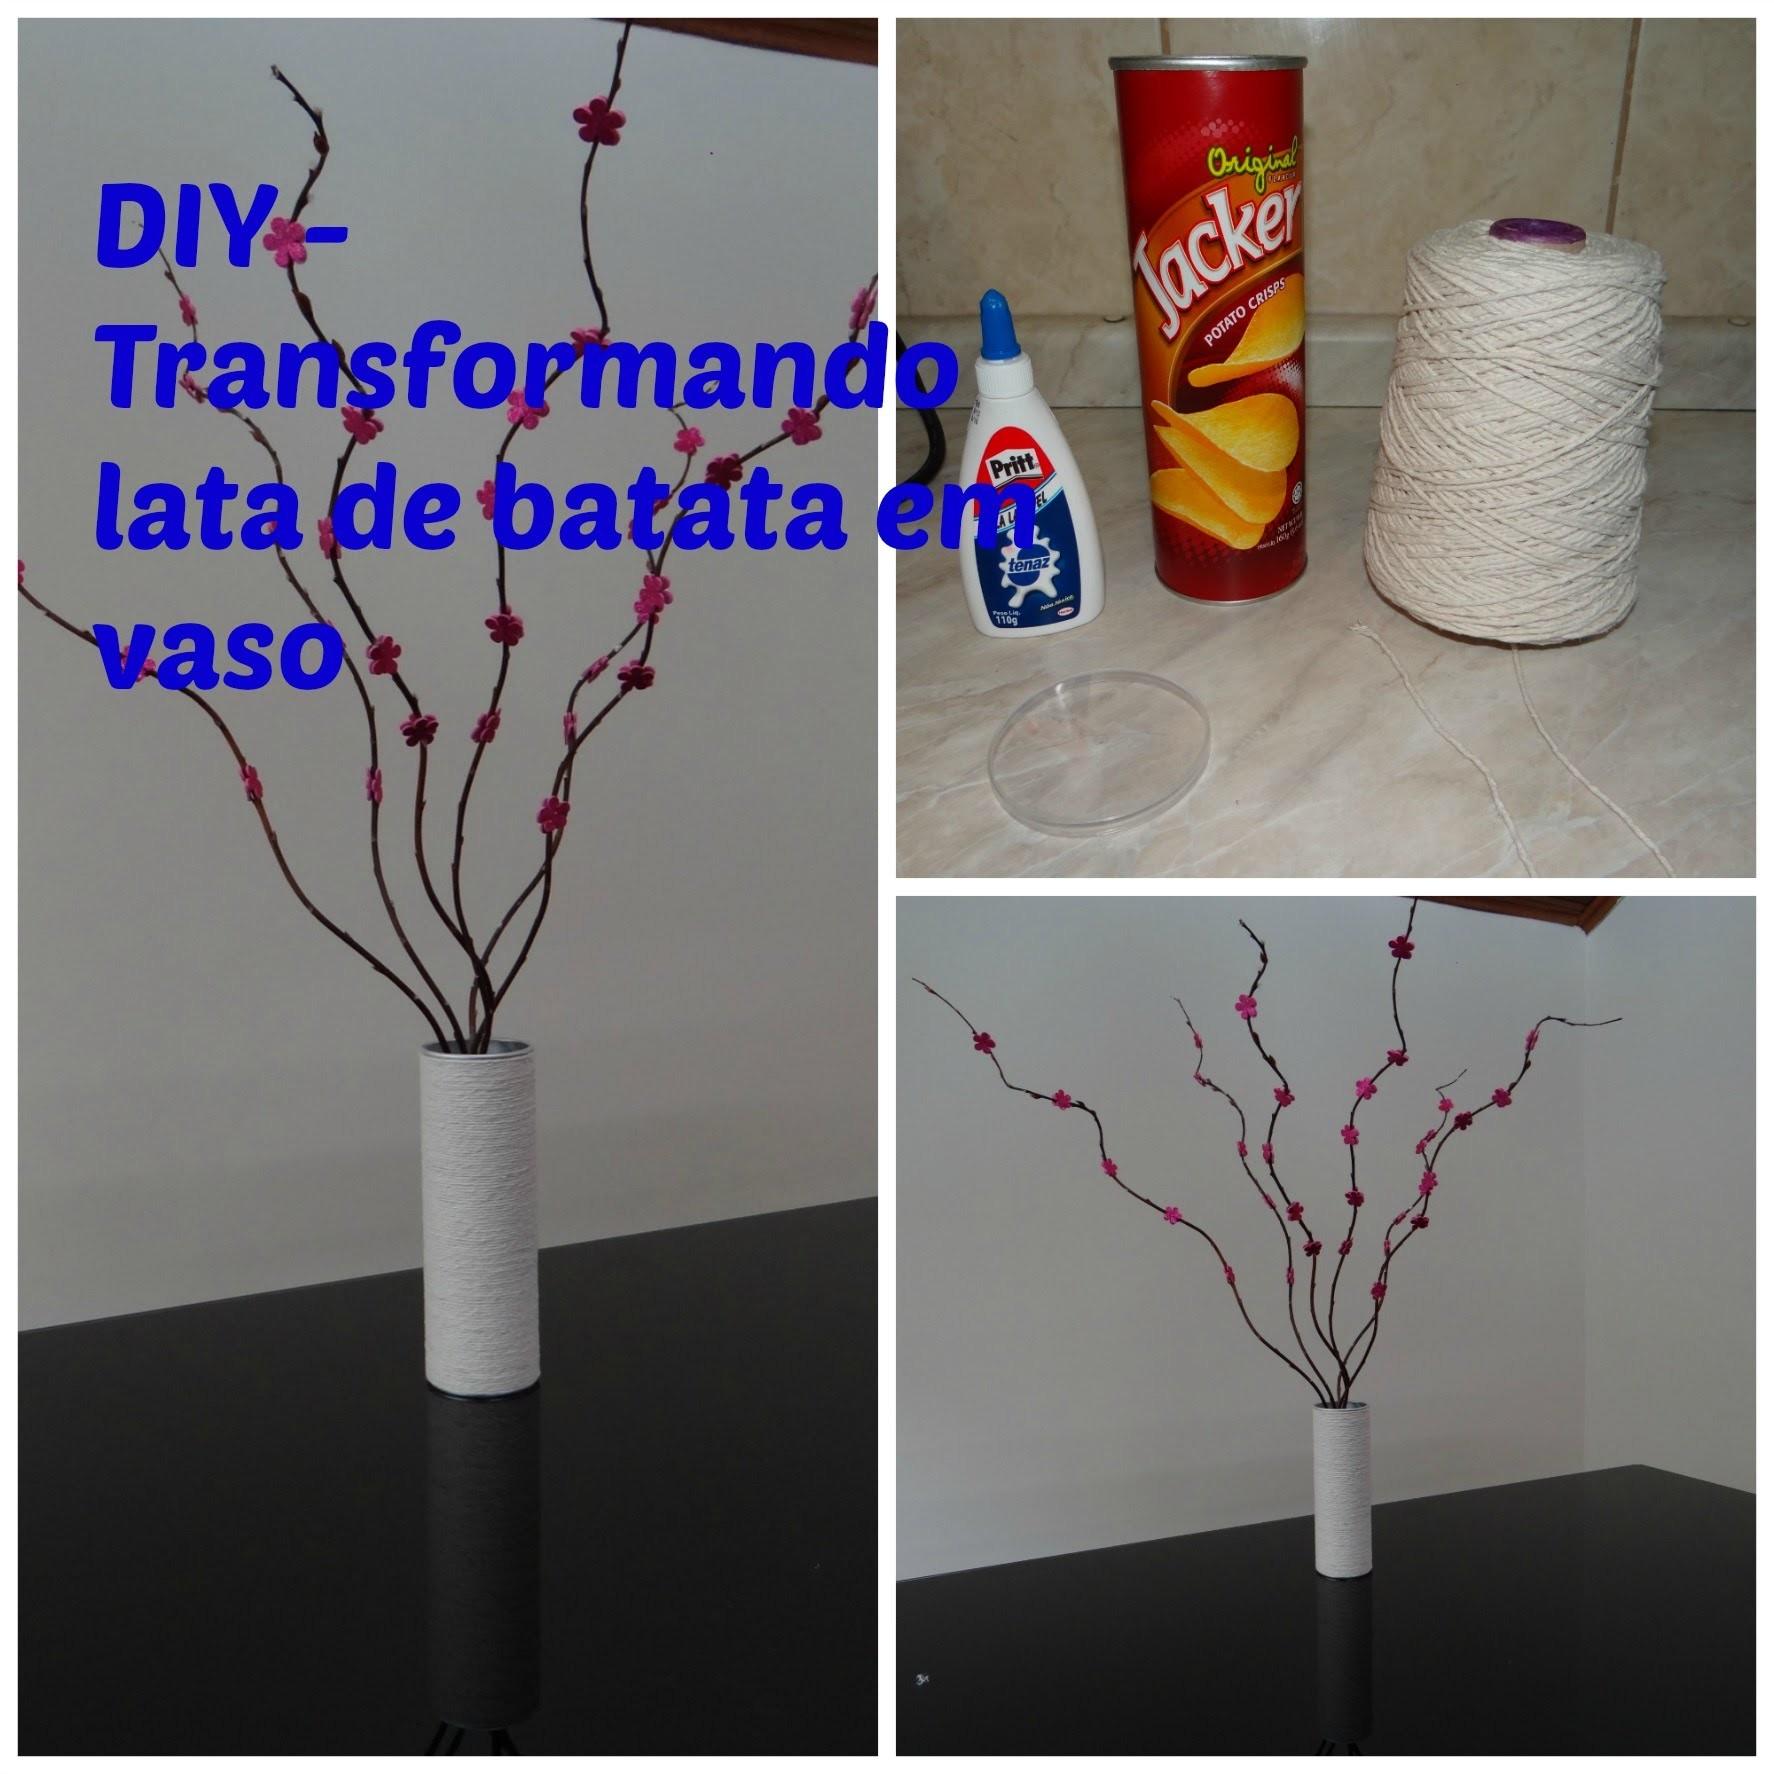 DIY - Transforme lata de batata pringles em vaso